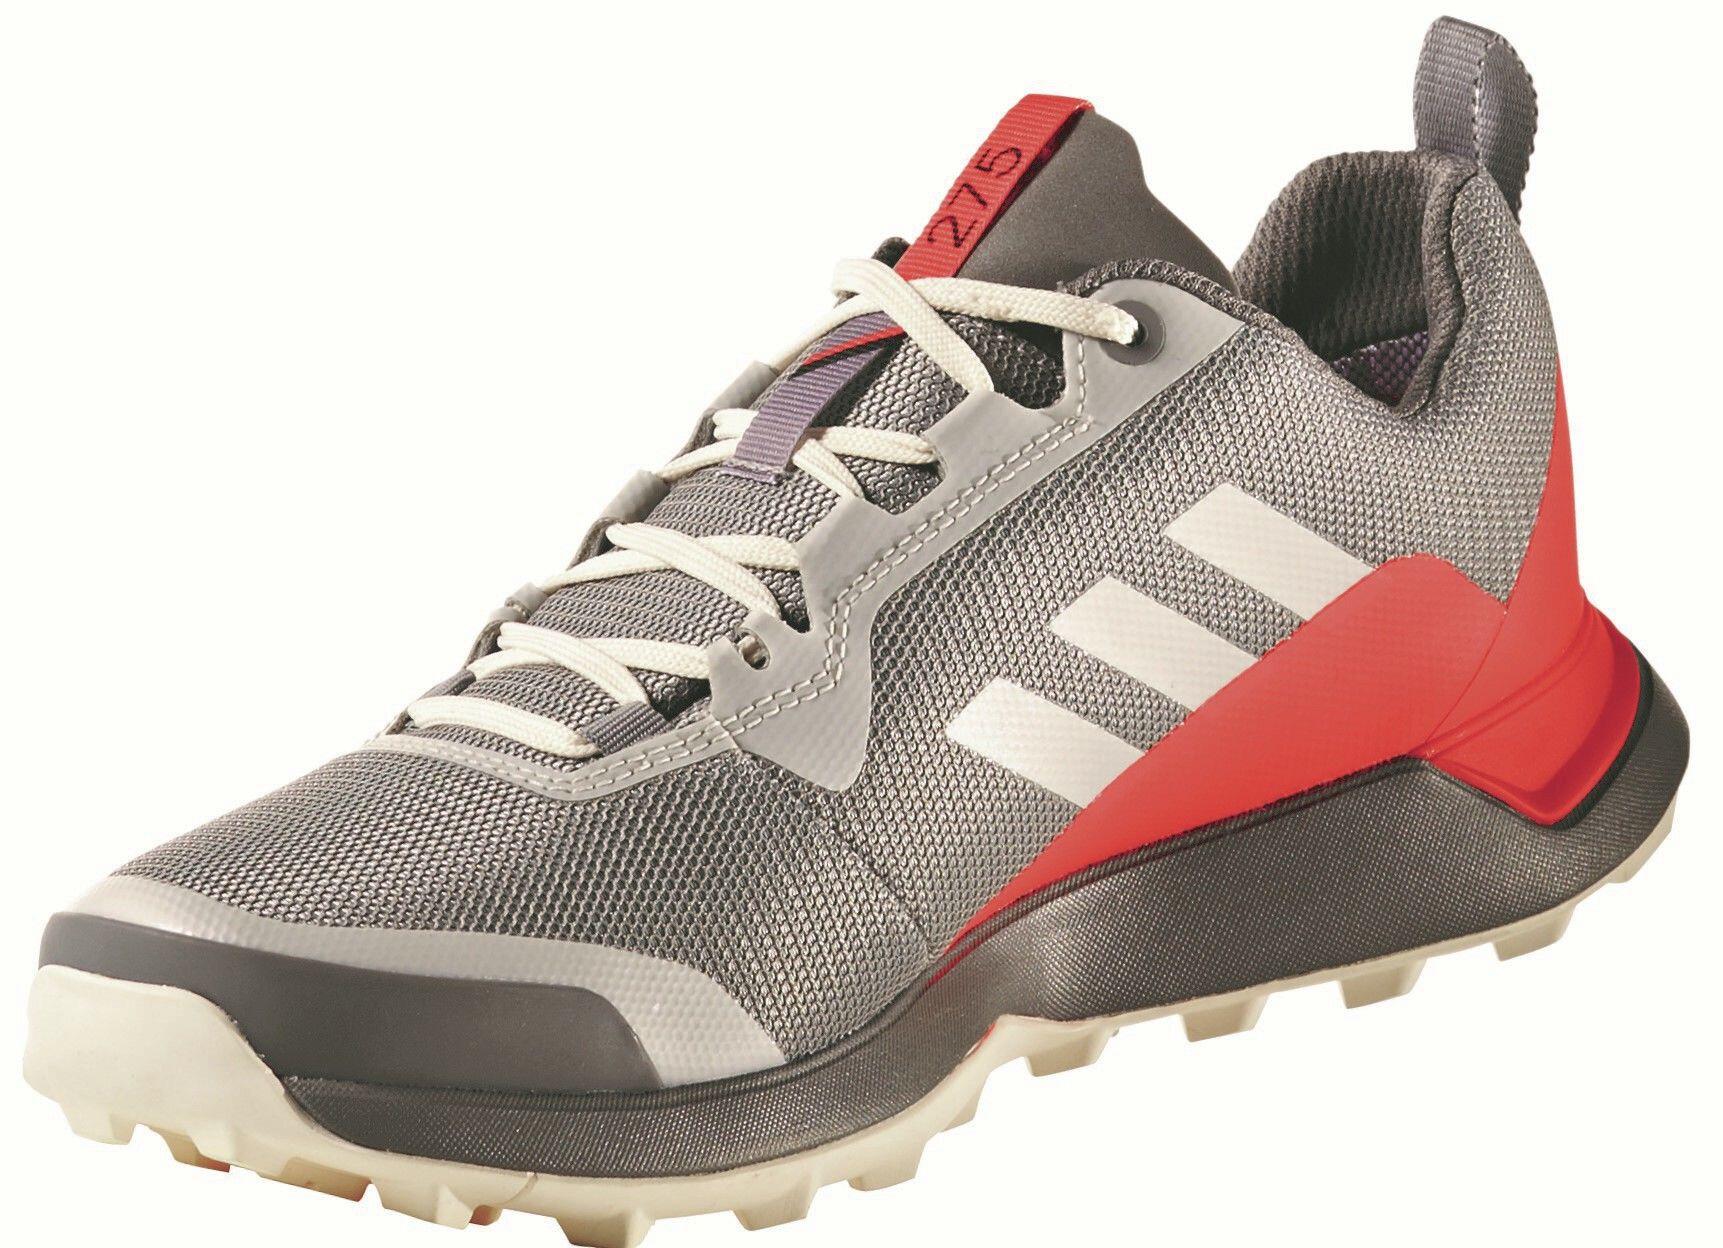 Adidas Terrex Gris Cmtk Chaussures Campz Gtx Femme Sur PdCwqd